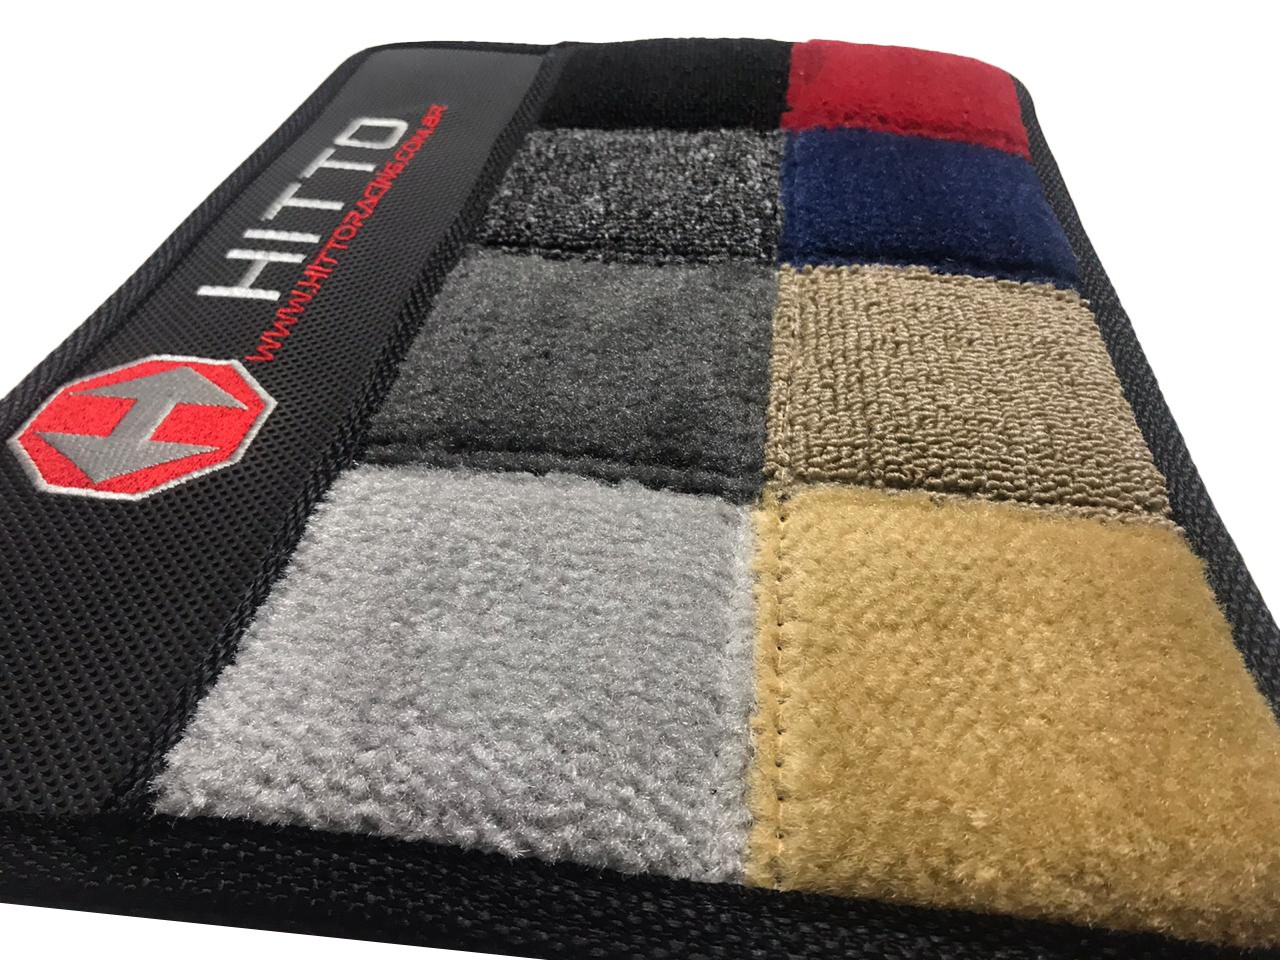 Tapete Focus Carpete Luxo Base Borracha Pinada